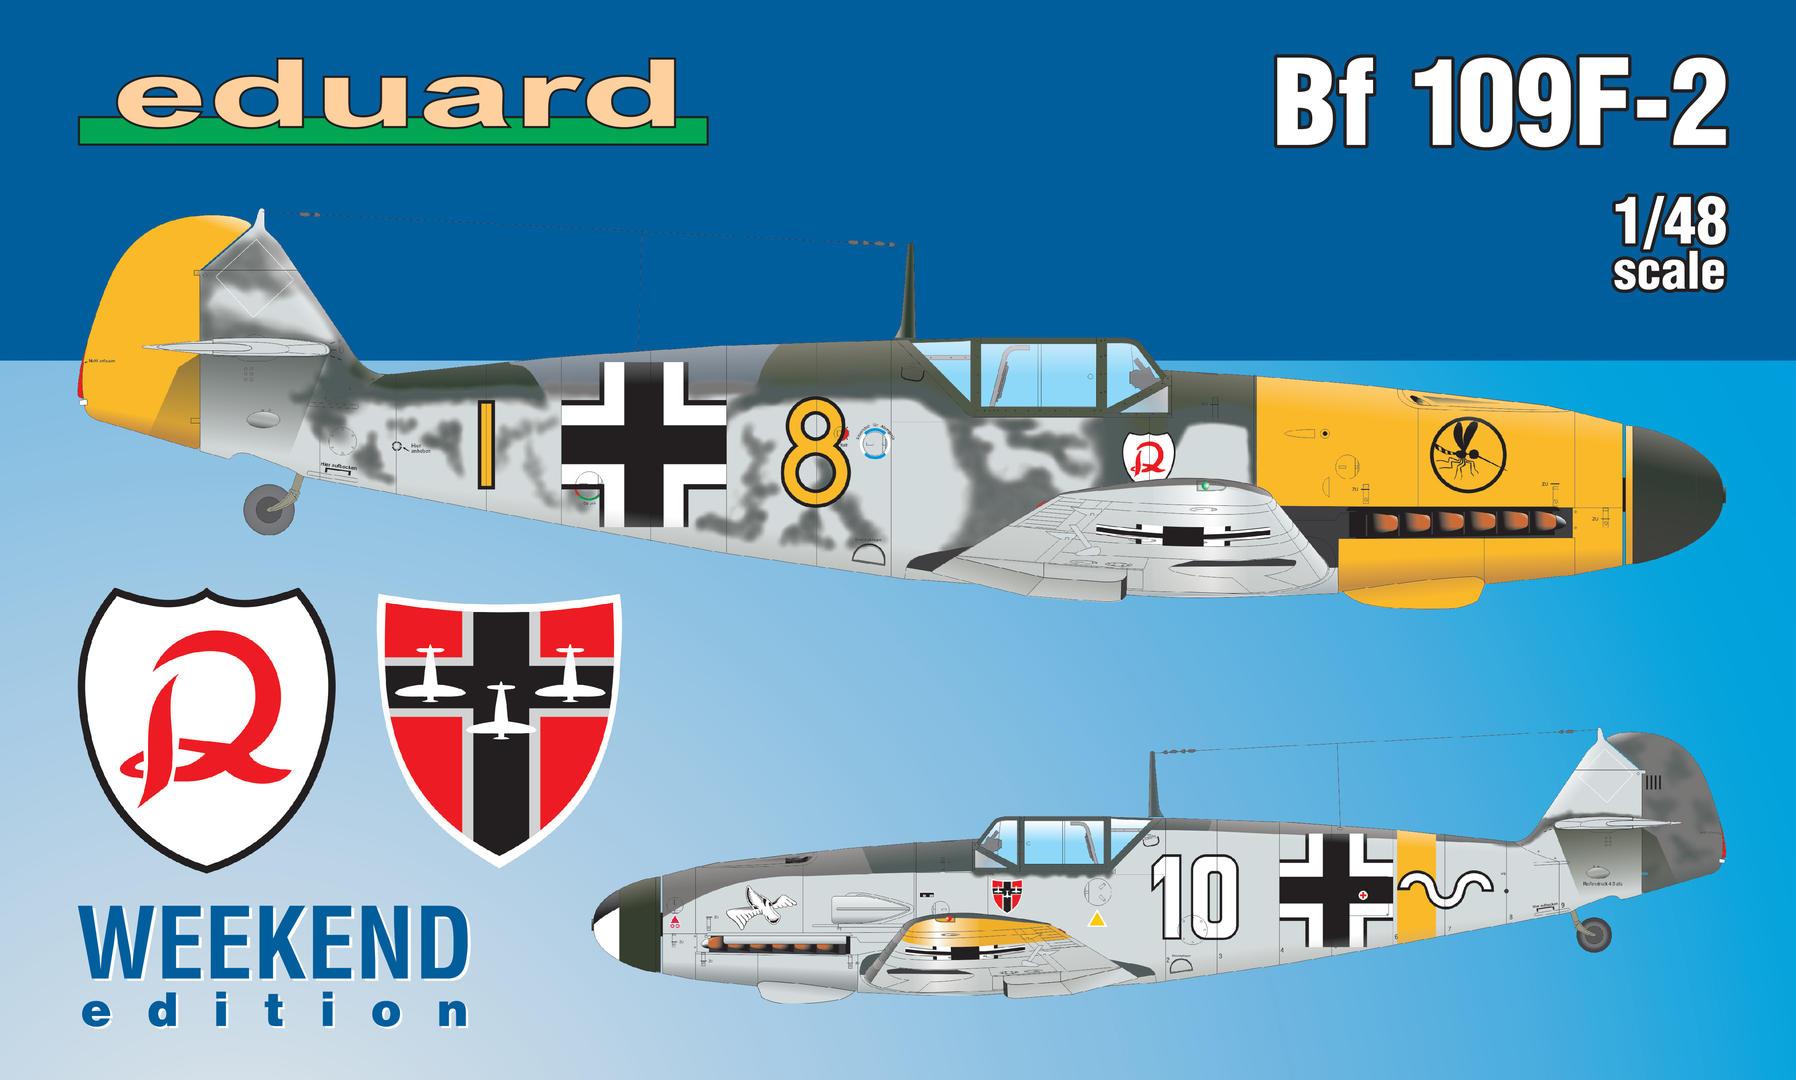 Maskierfolie Neu Eduard Accessories Cx414-1:72 Defiant Mk.I For Airfix